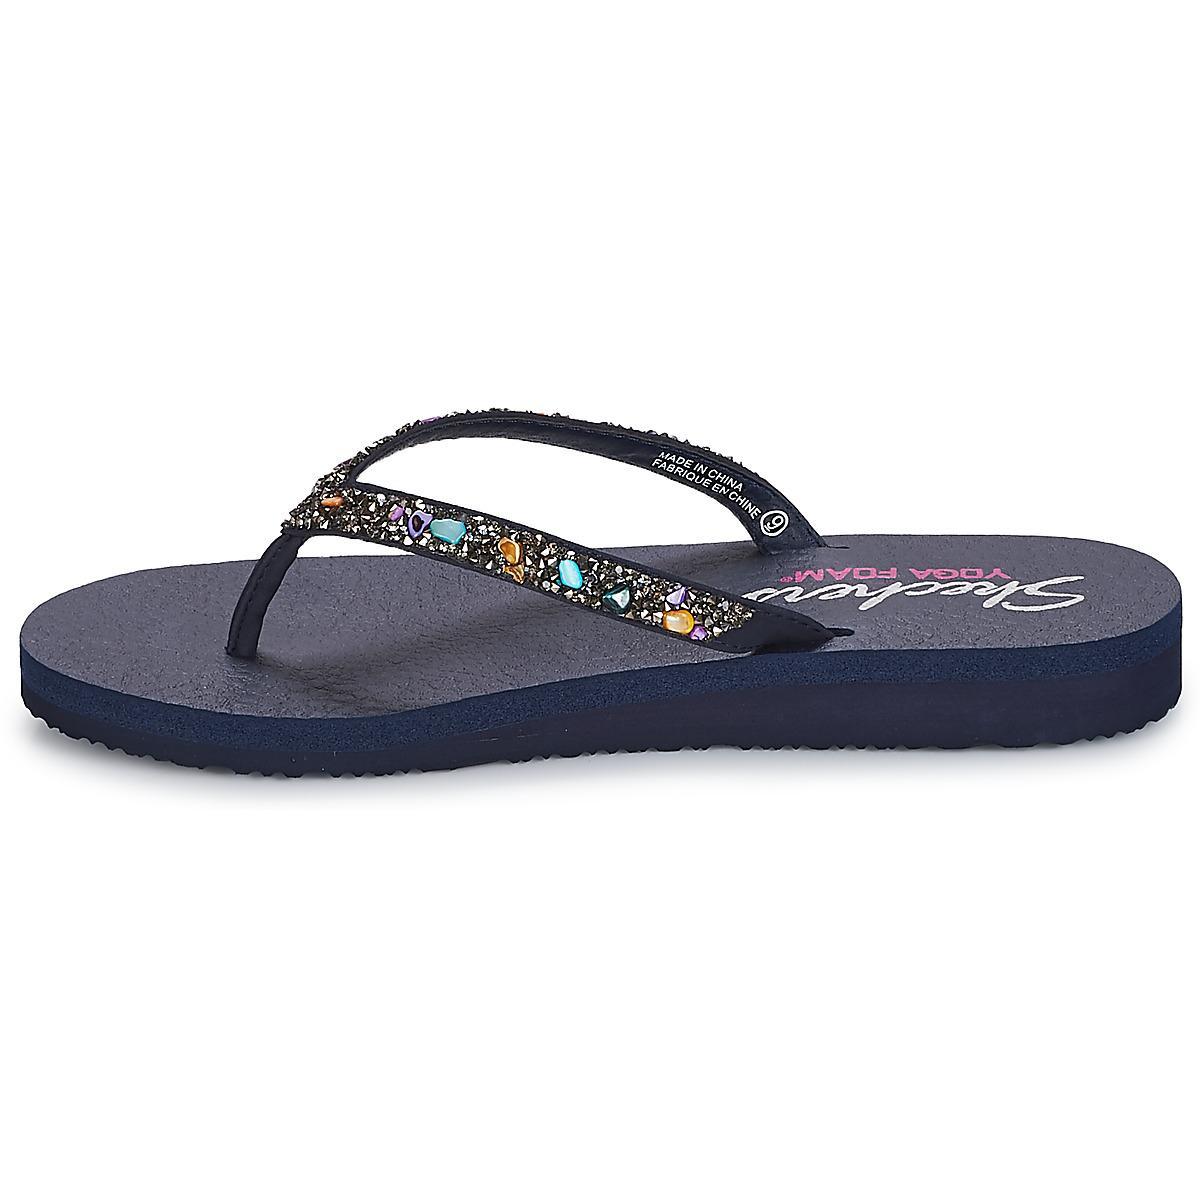 skechers womens flip flops